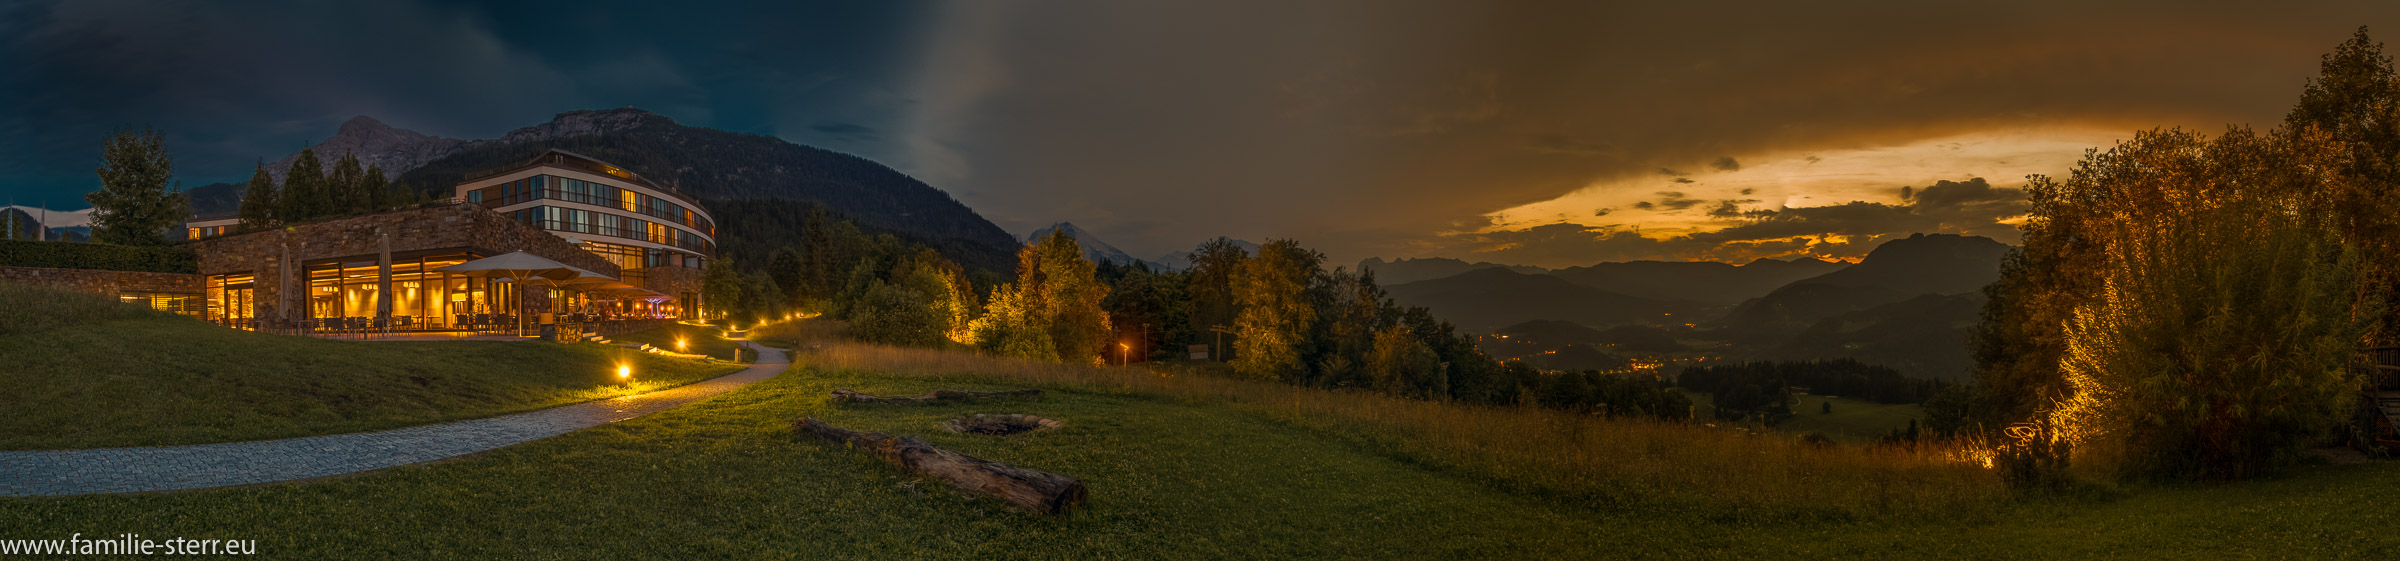 Sonnenuntergangspanorama vom Obersalzberg